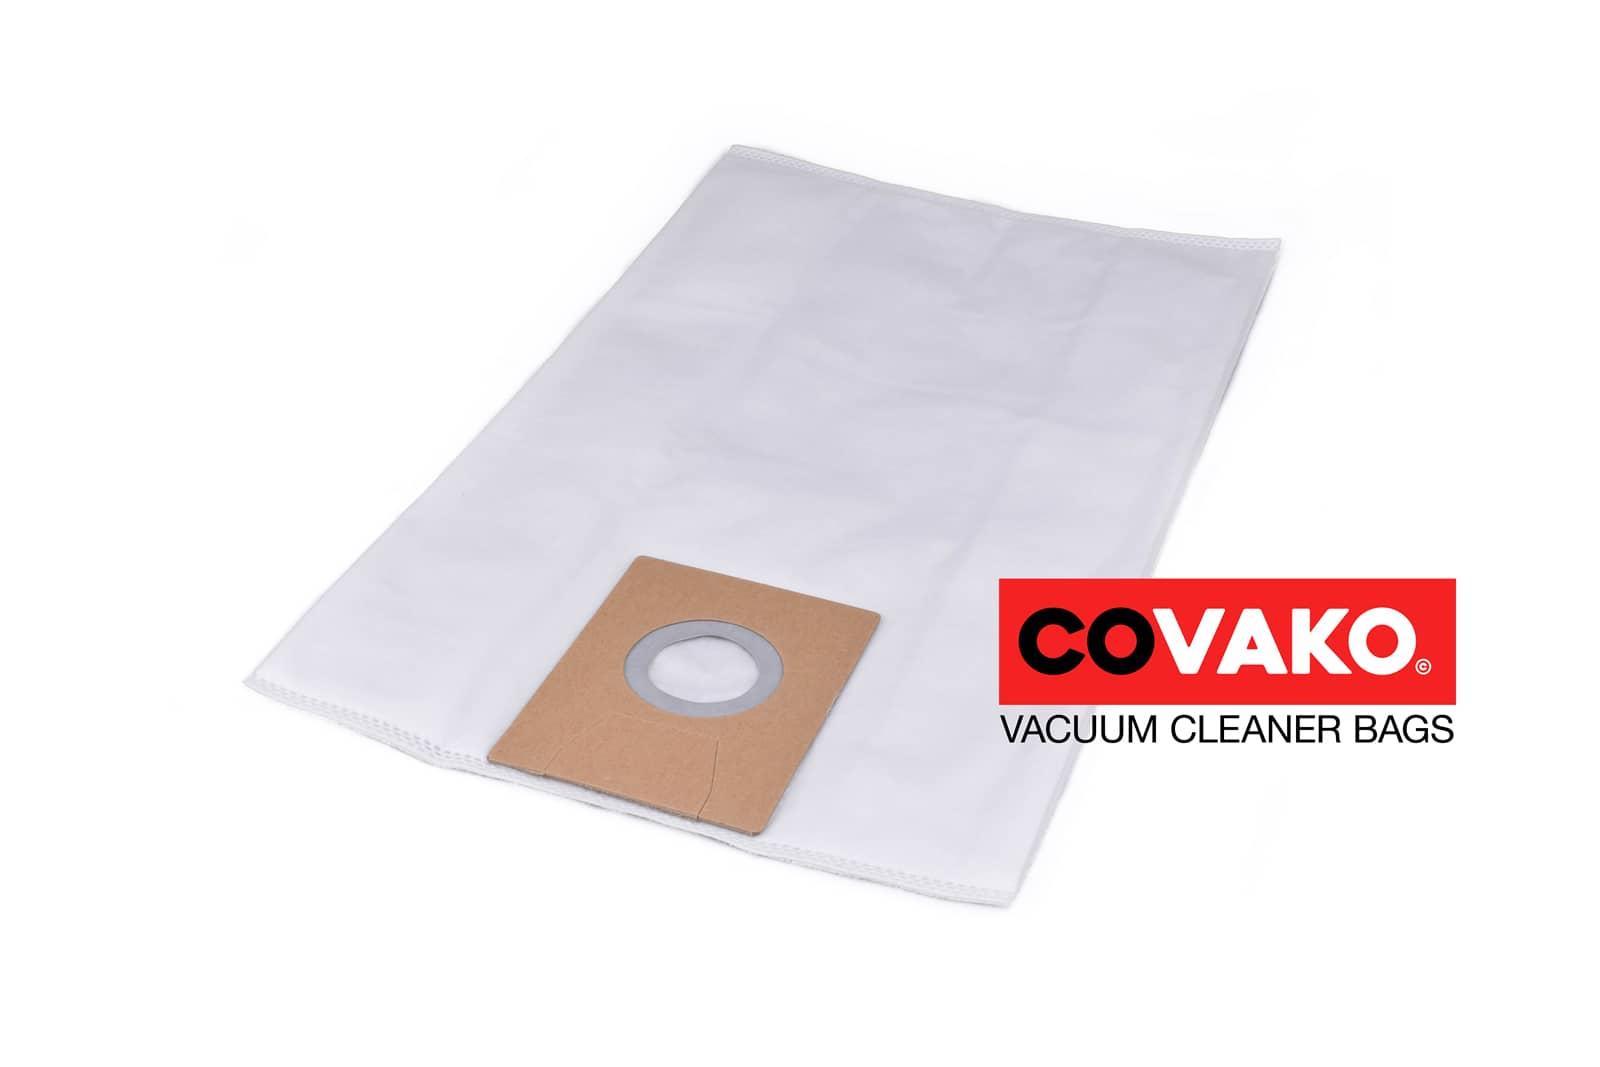 Ivac K103200941 / Synthetisch - Ivac Staubsaugerbeutel